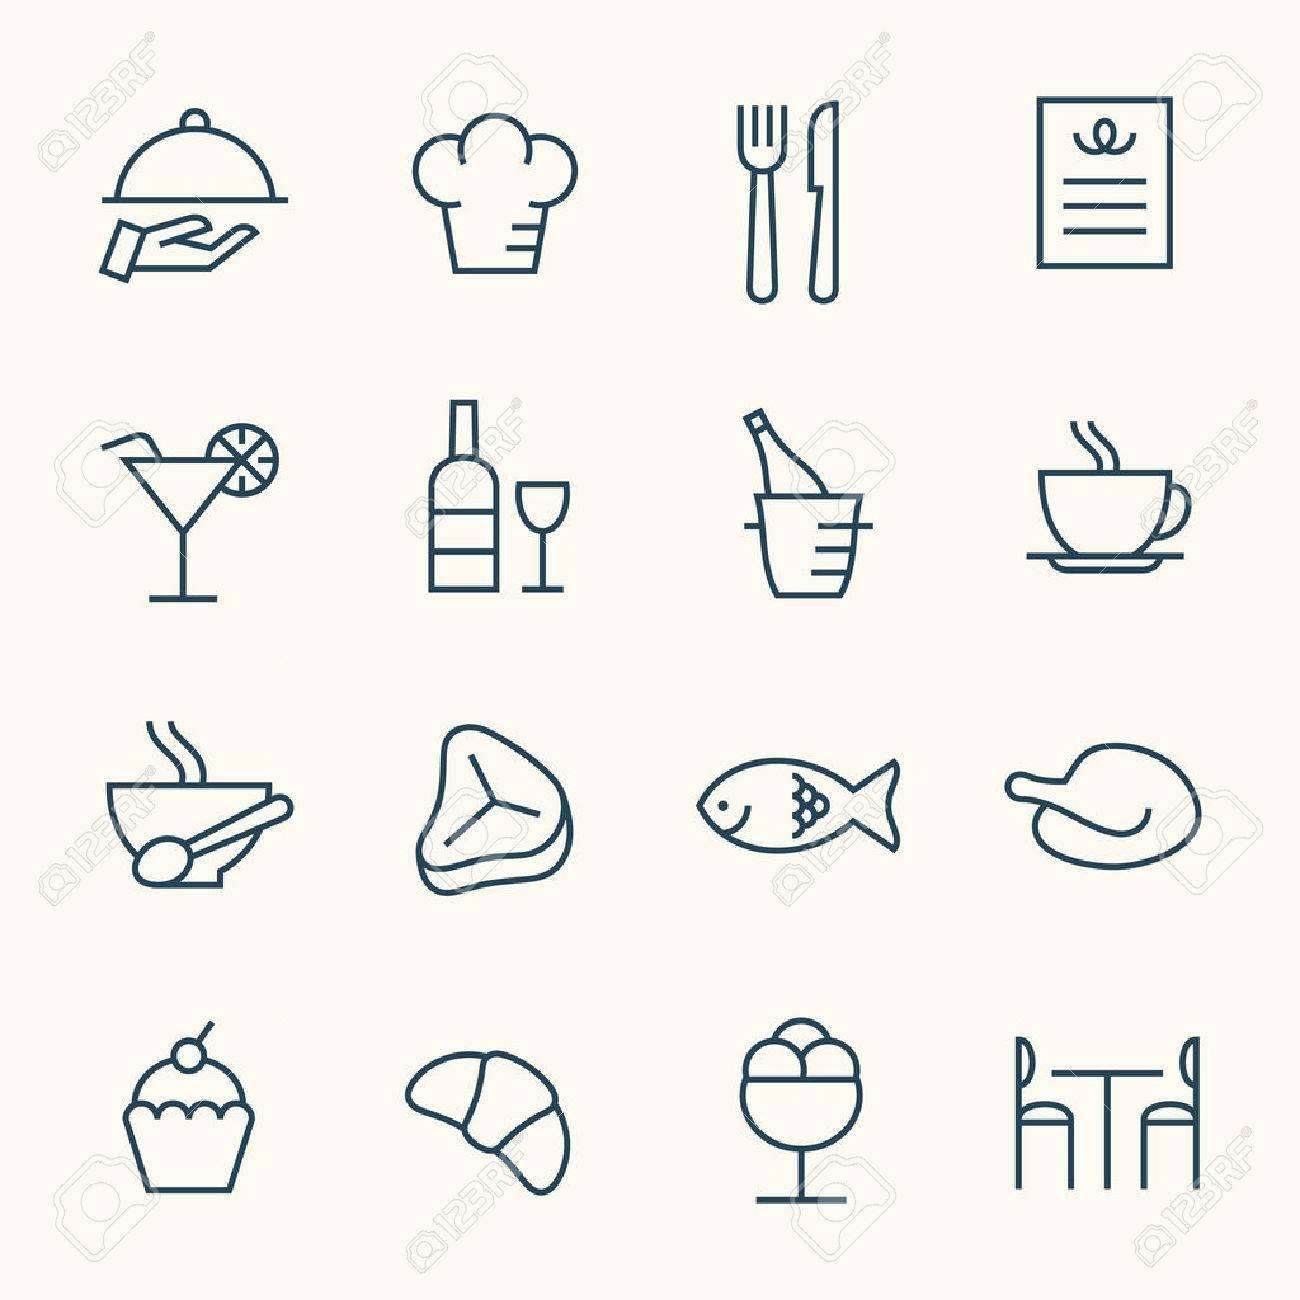 Restaurant icon set - 43211436